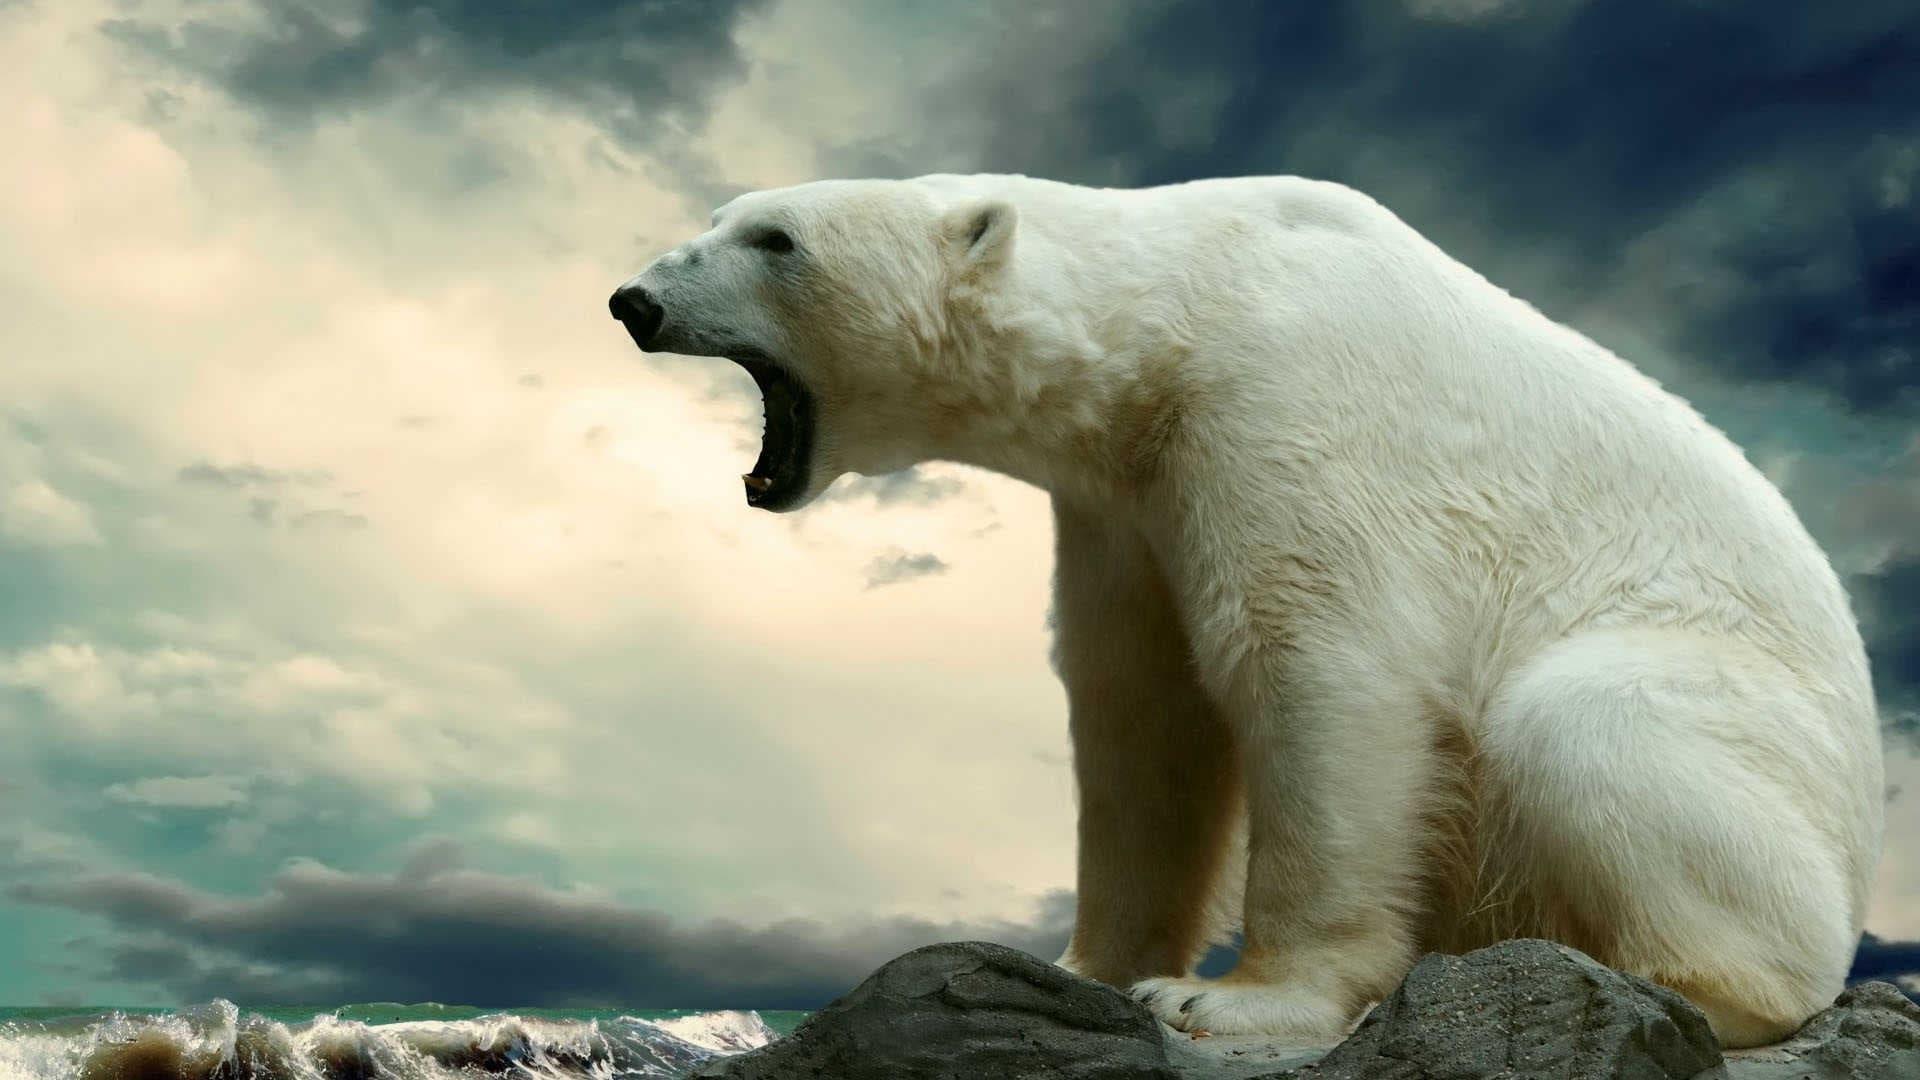 Bear desktop wallpaper